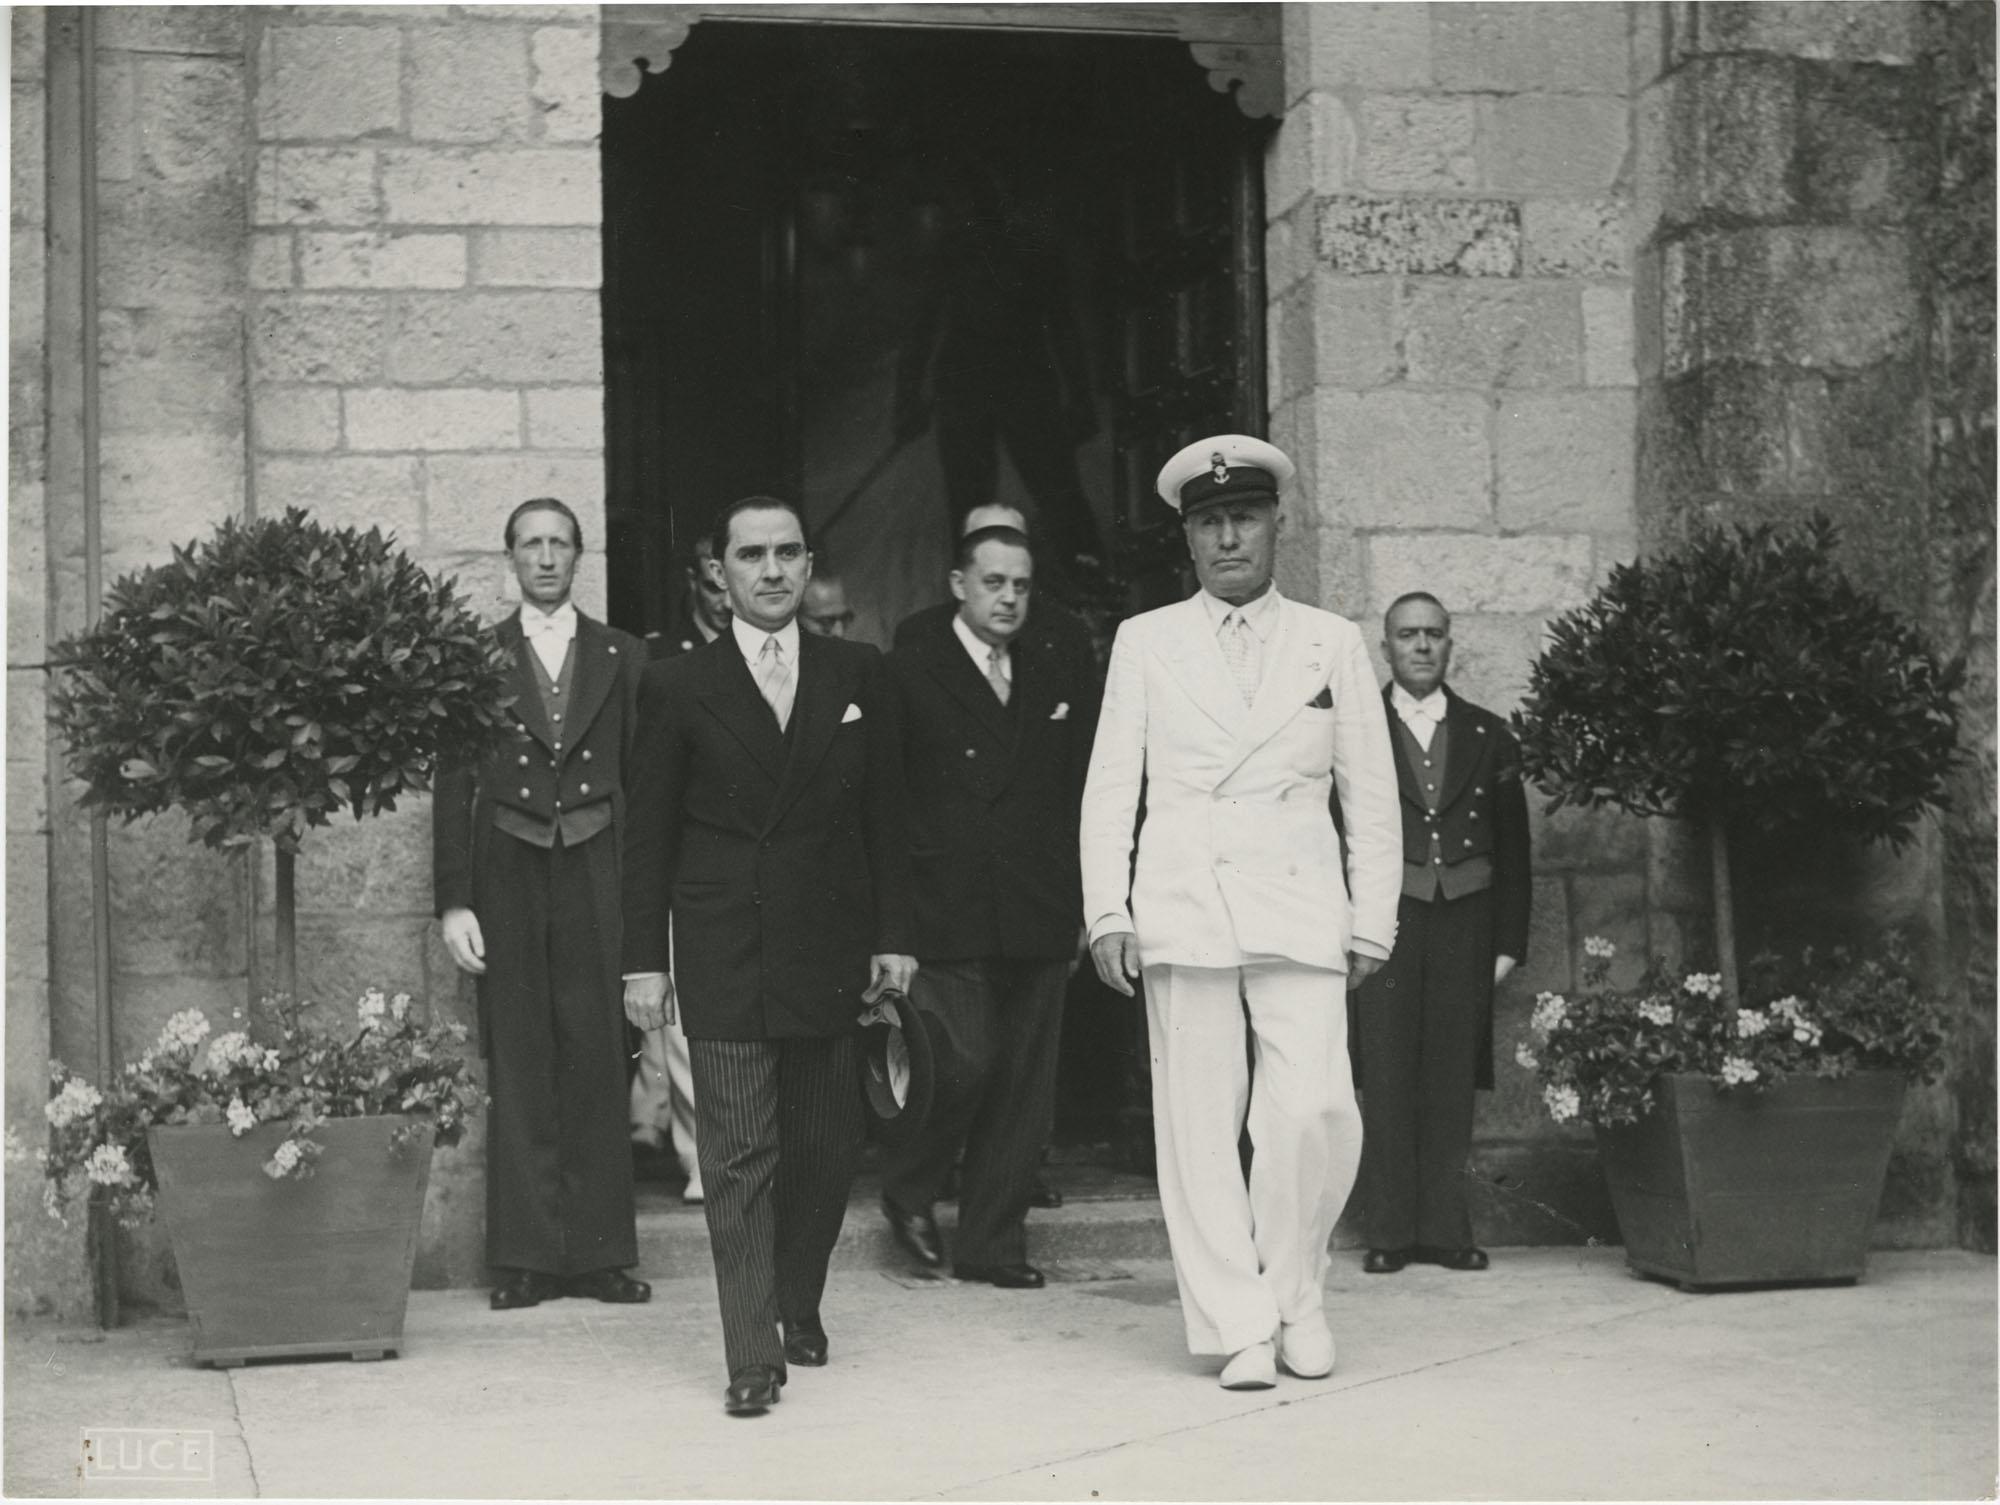 Mihai Antonescu's visit to Benito Mussolini, Photograph 50